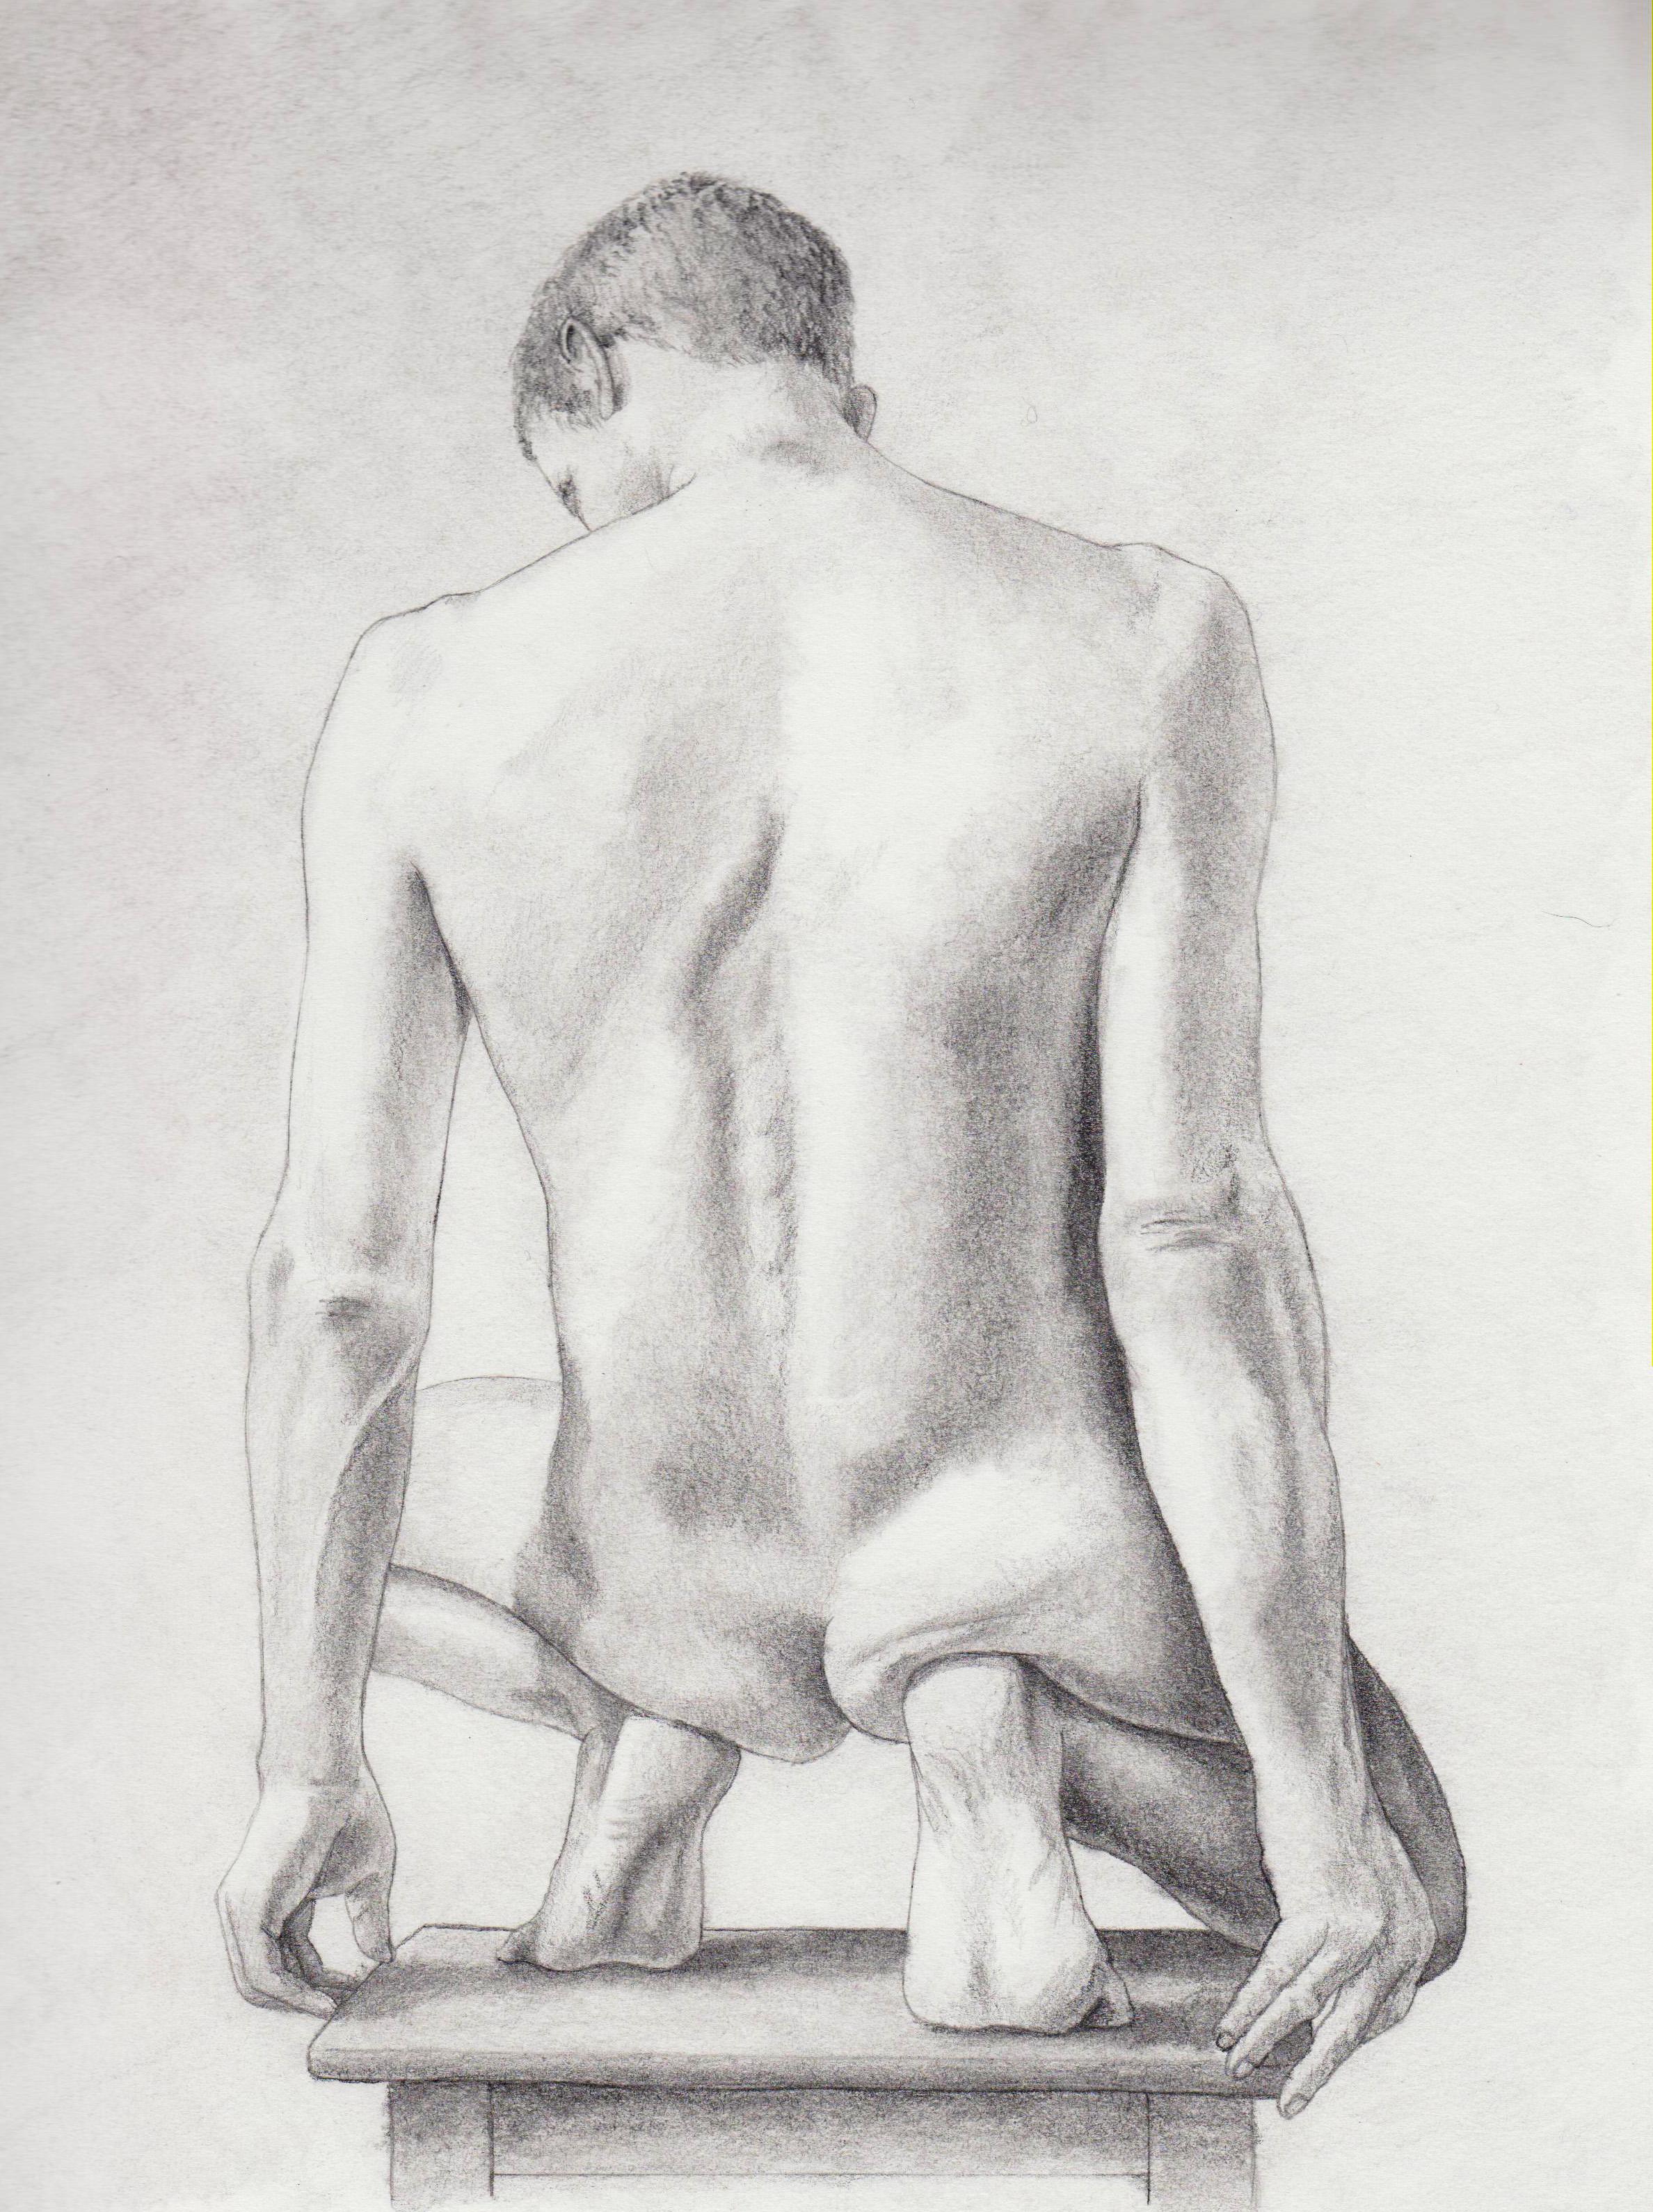 Male figure squatting